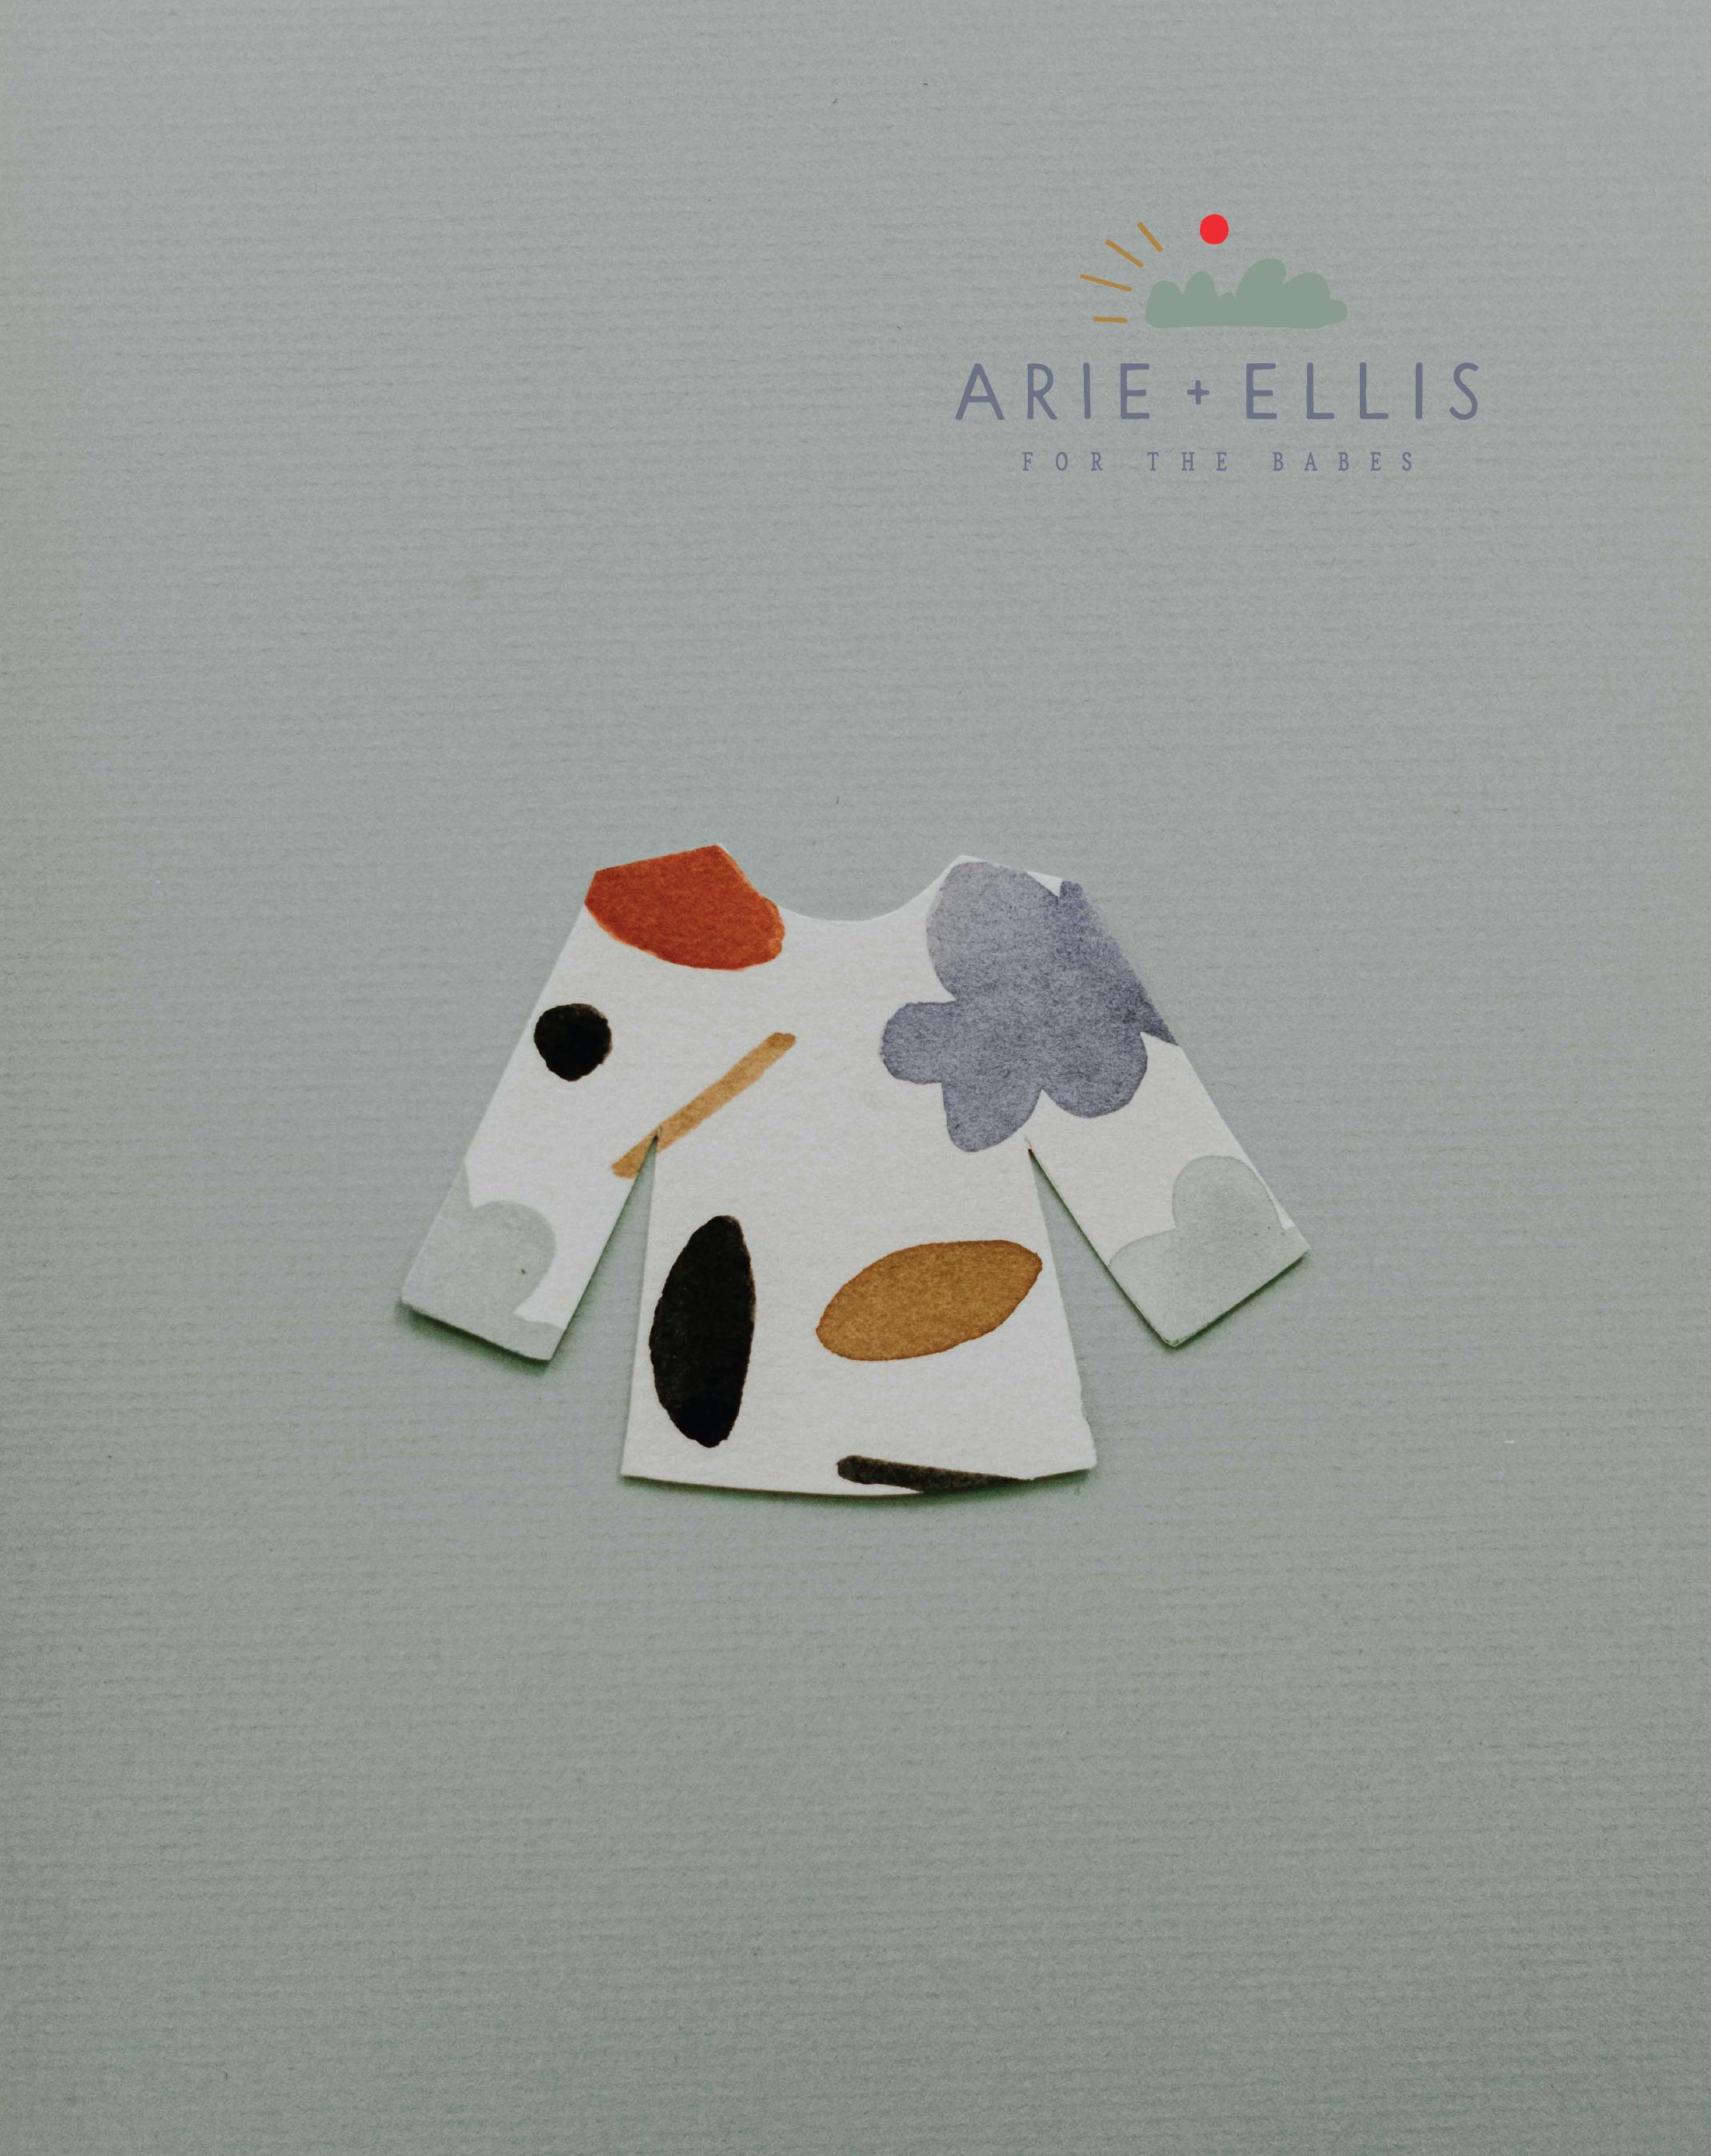 arie and ellis branding by anna nunez